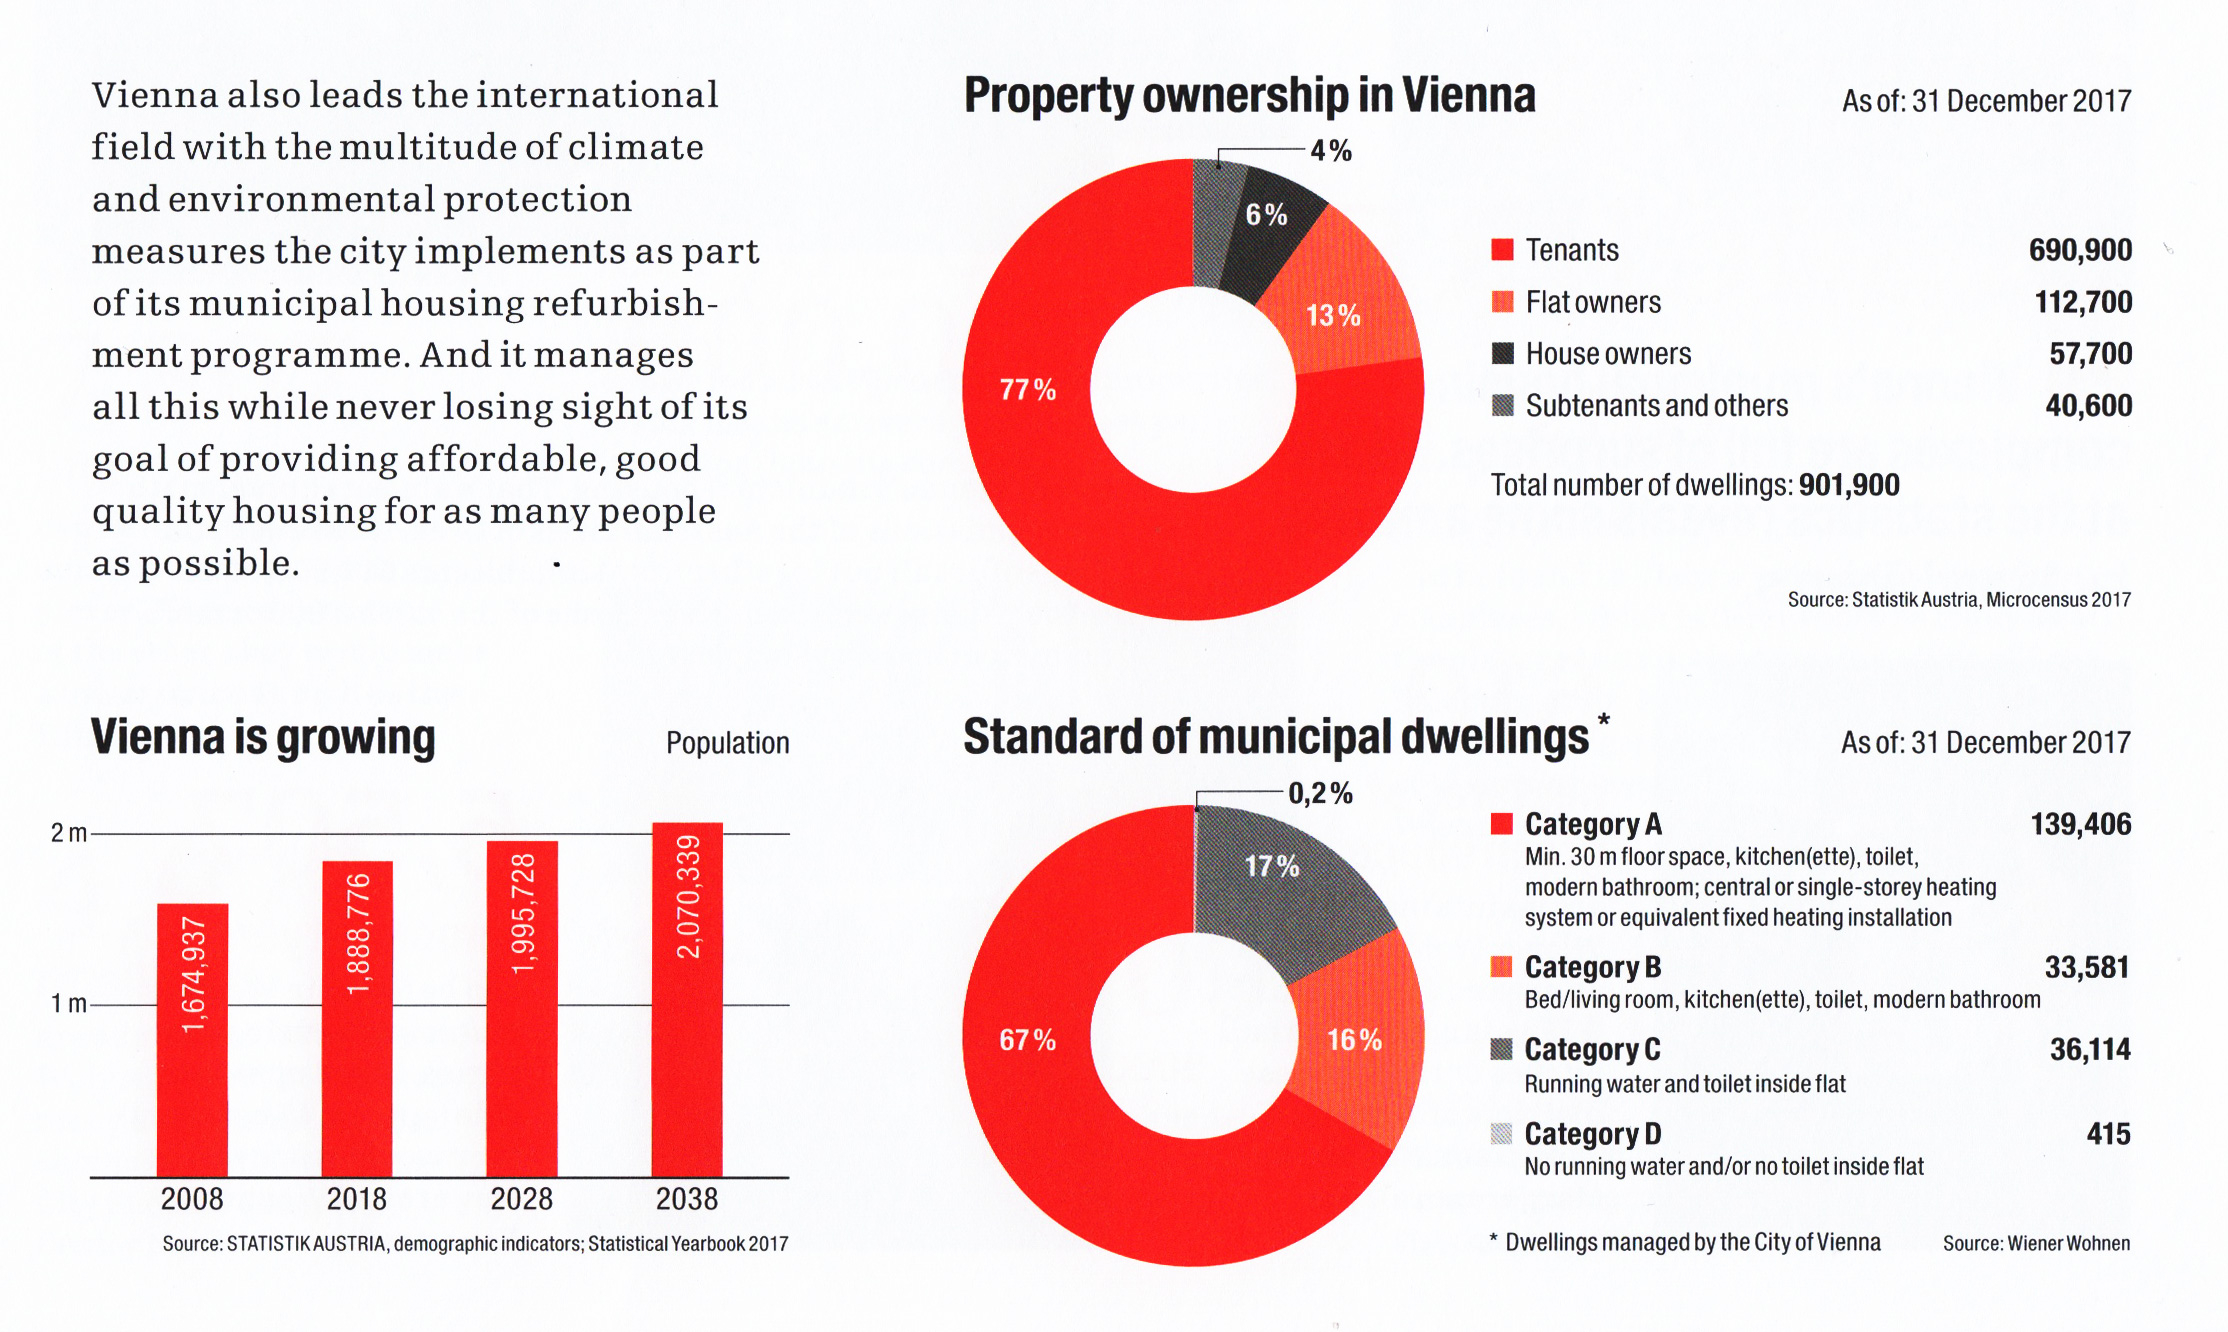 Property ownership and municipal housing standards in Vienna - source: City of Vienna - Wiener Wohnen, 2018